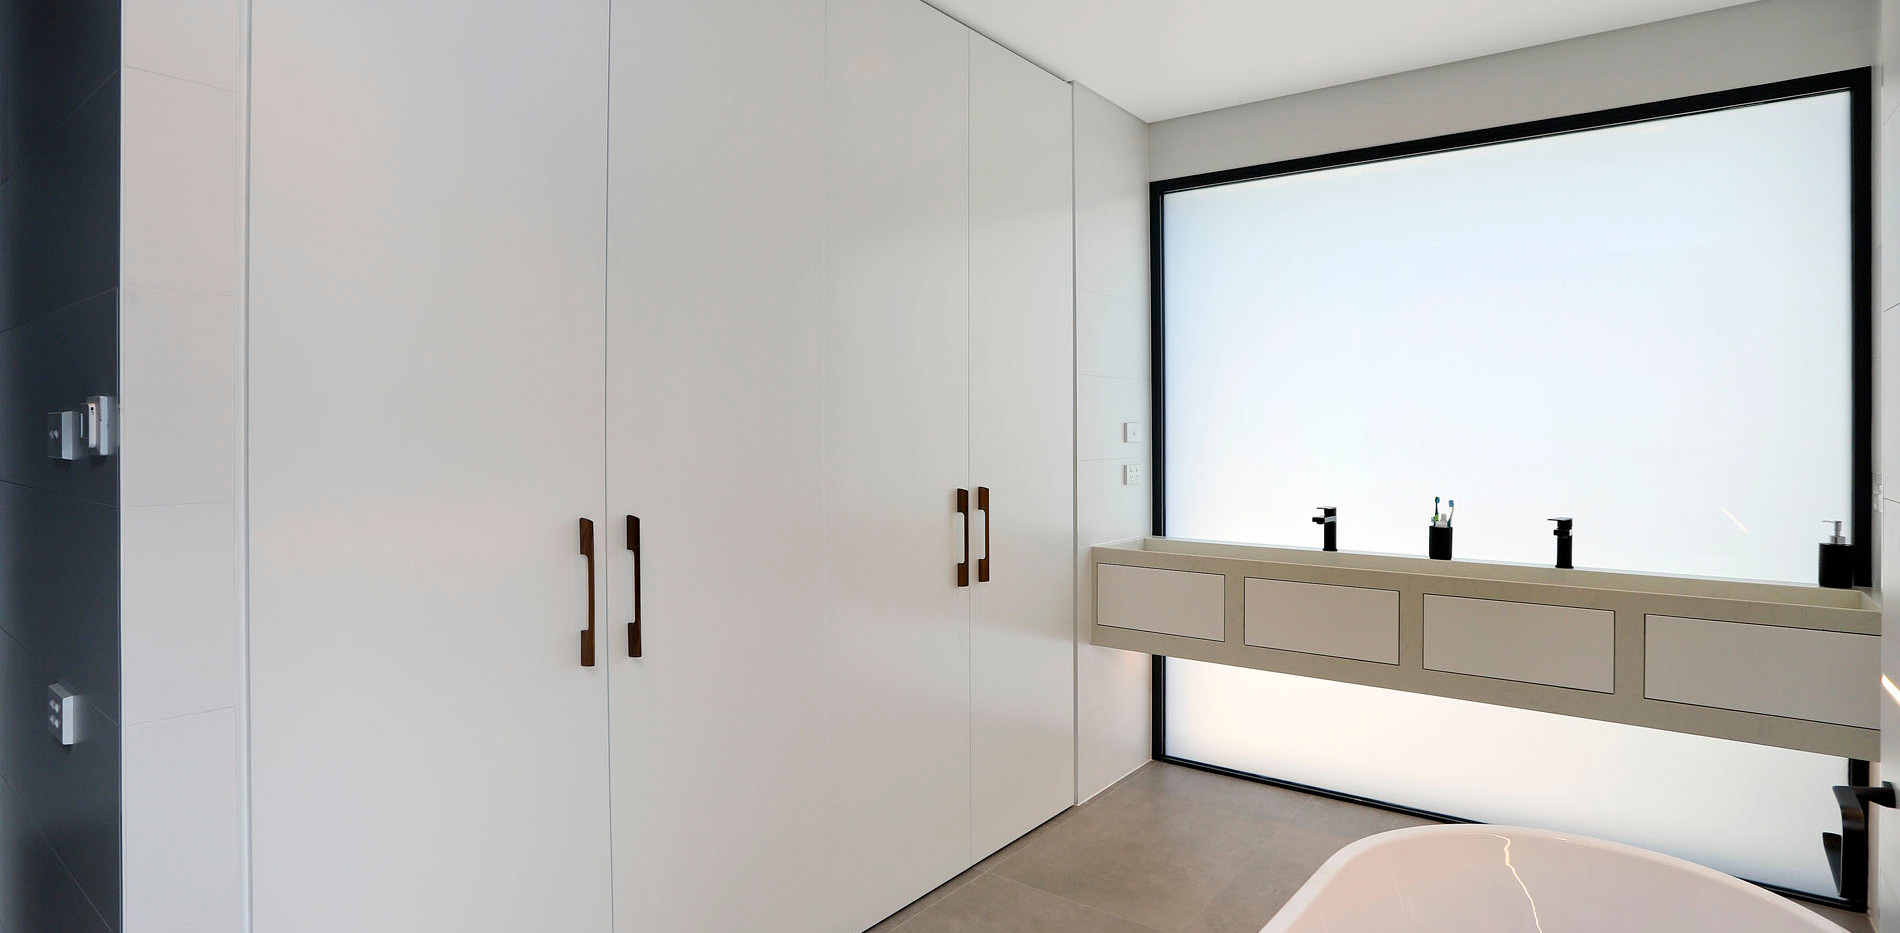 Small Bathrooms-Powder Rooms (18)